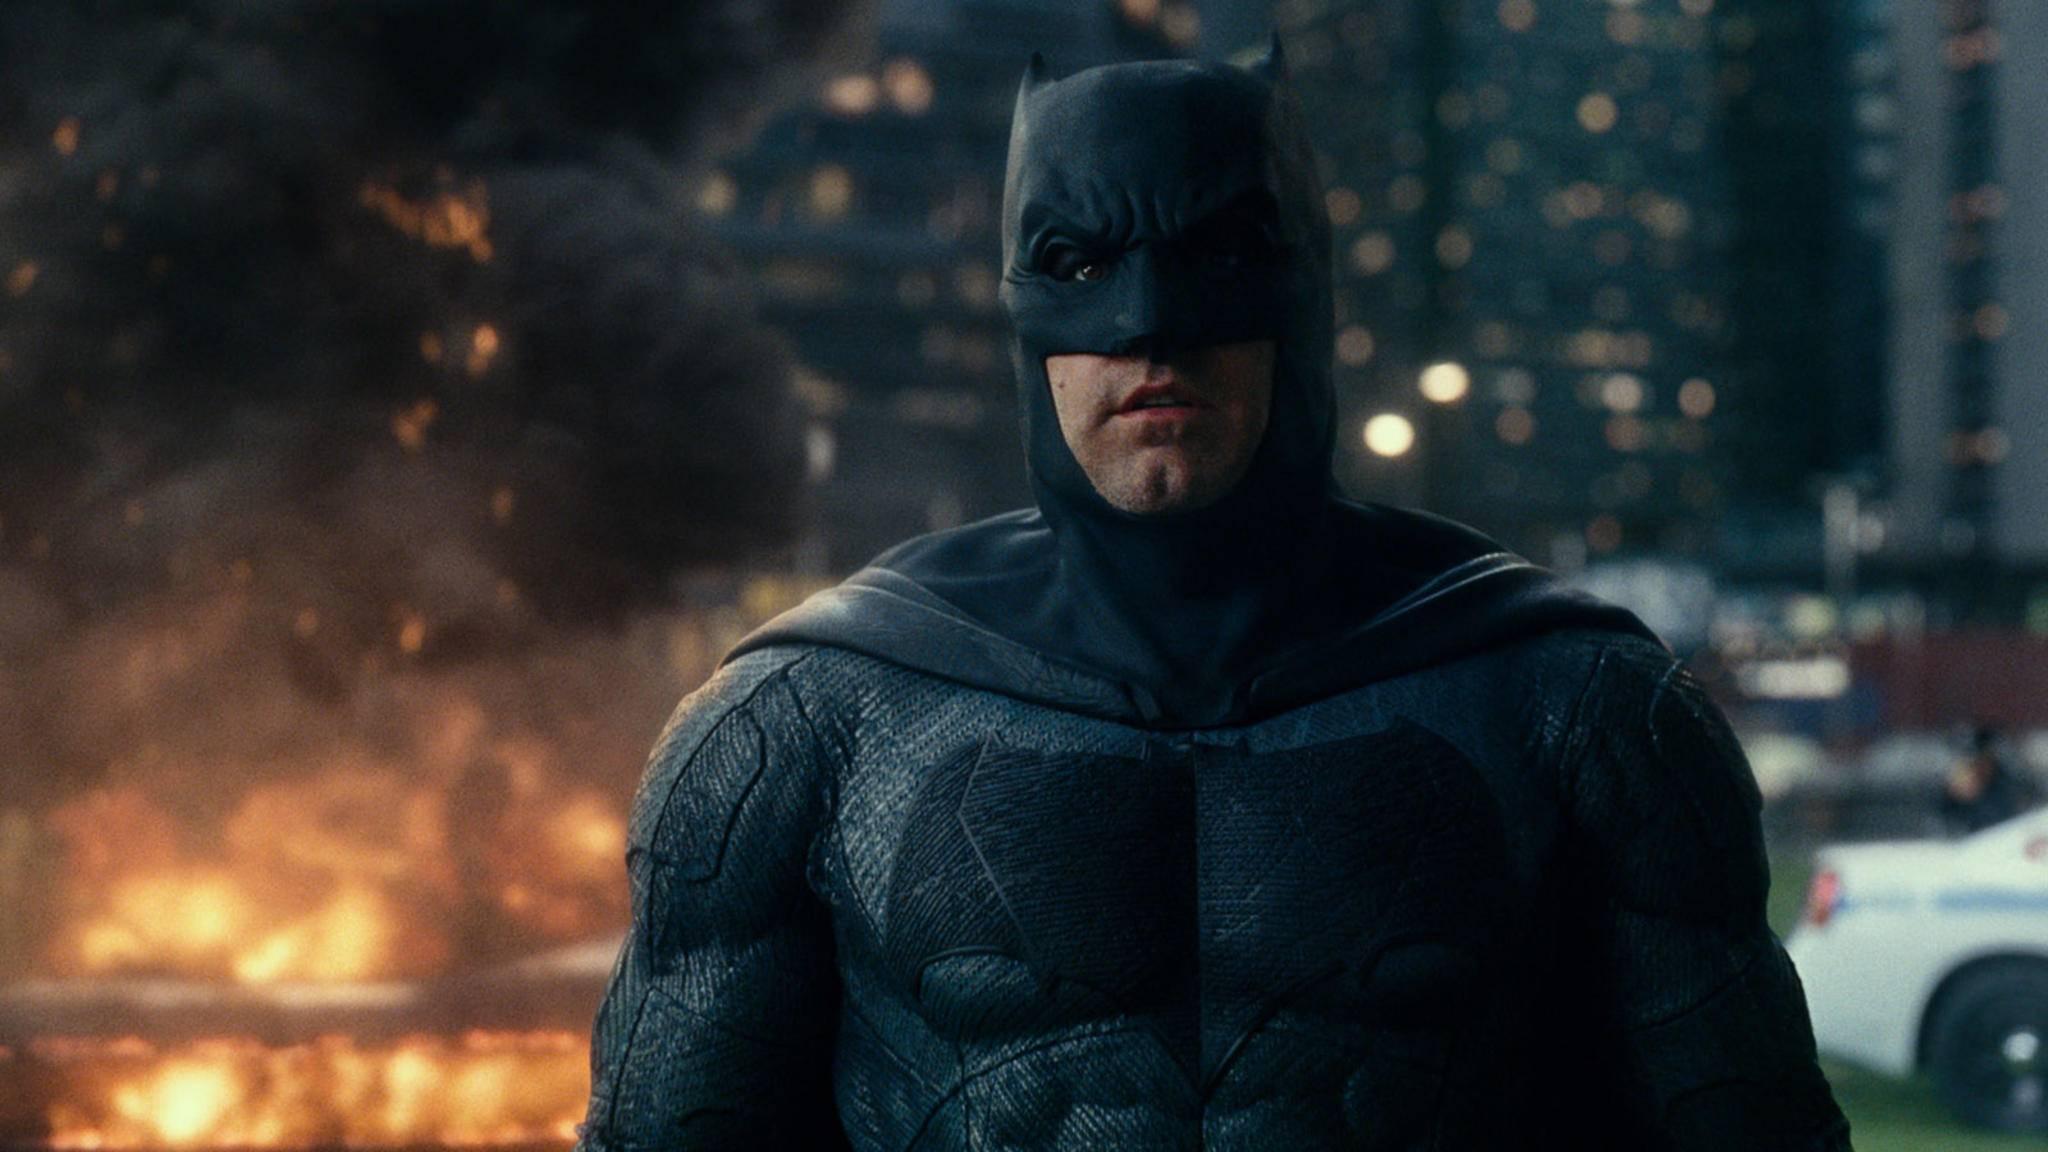 Ist Ben Affleck als Batman nun endgültig raus?